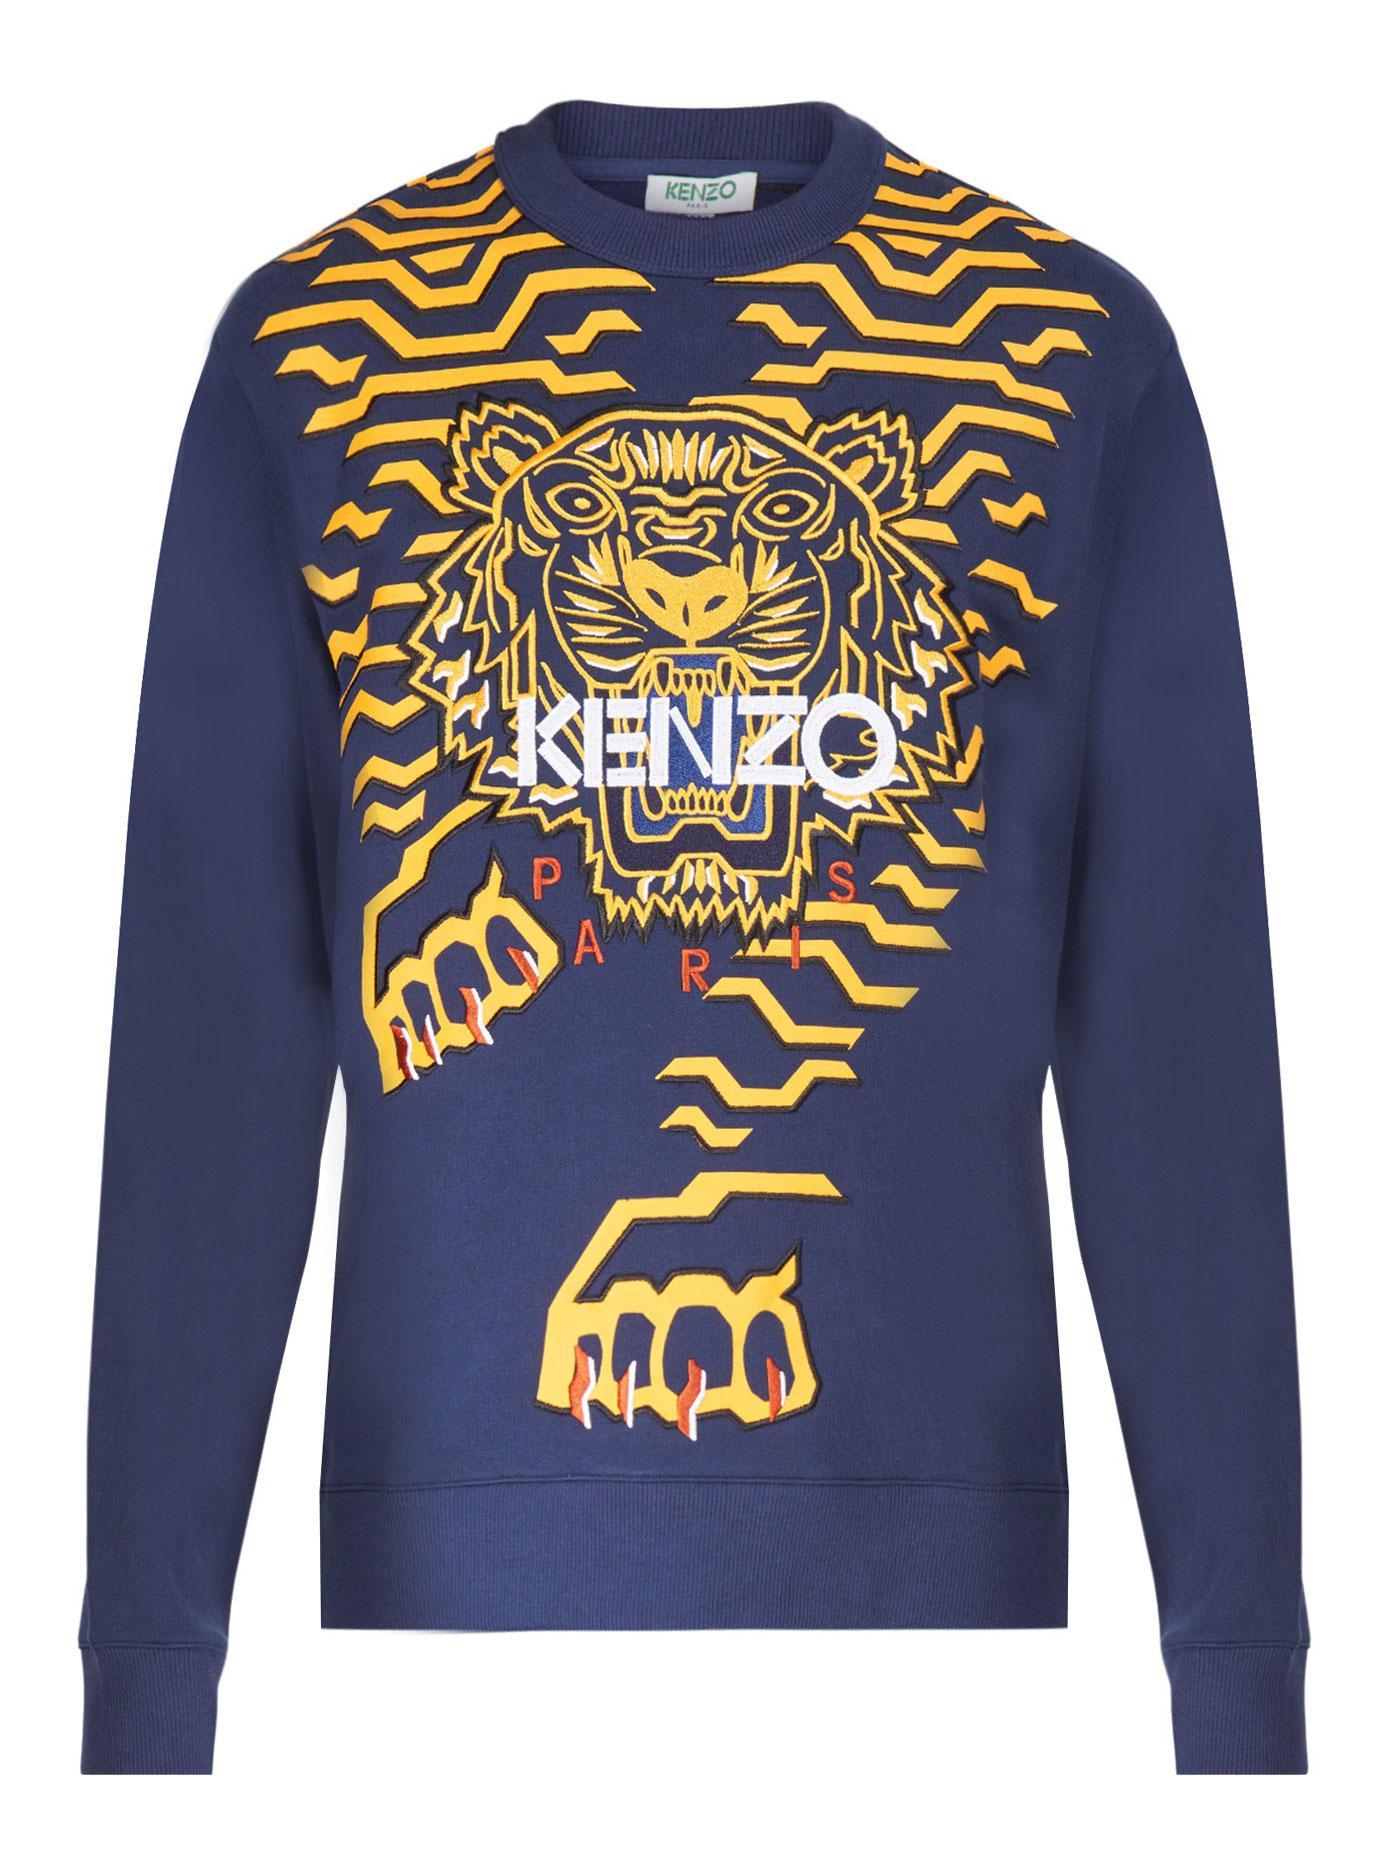 Kenzo Geo Tiger Classic Cotton Sweatshirt in Blue for Men - Lyst d02b0c591df